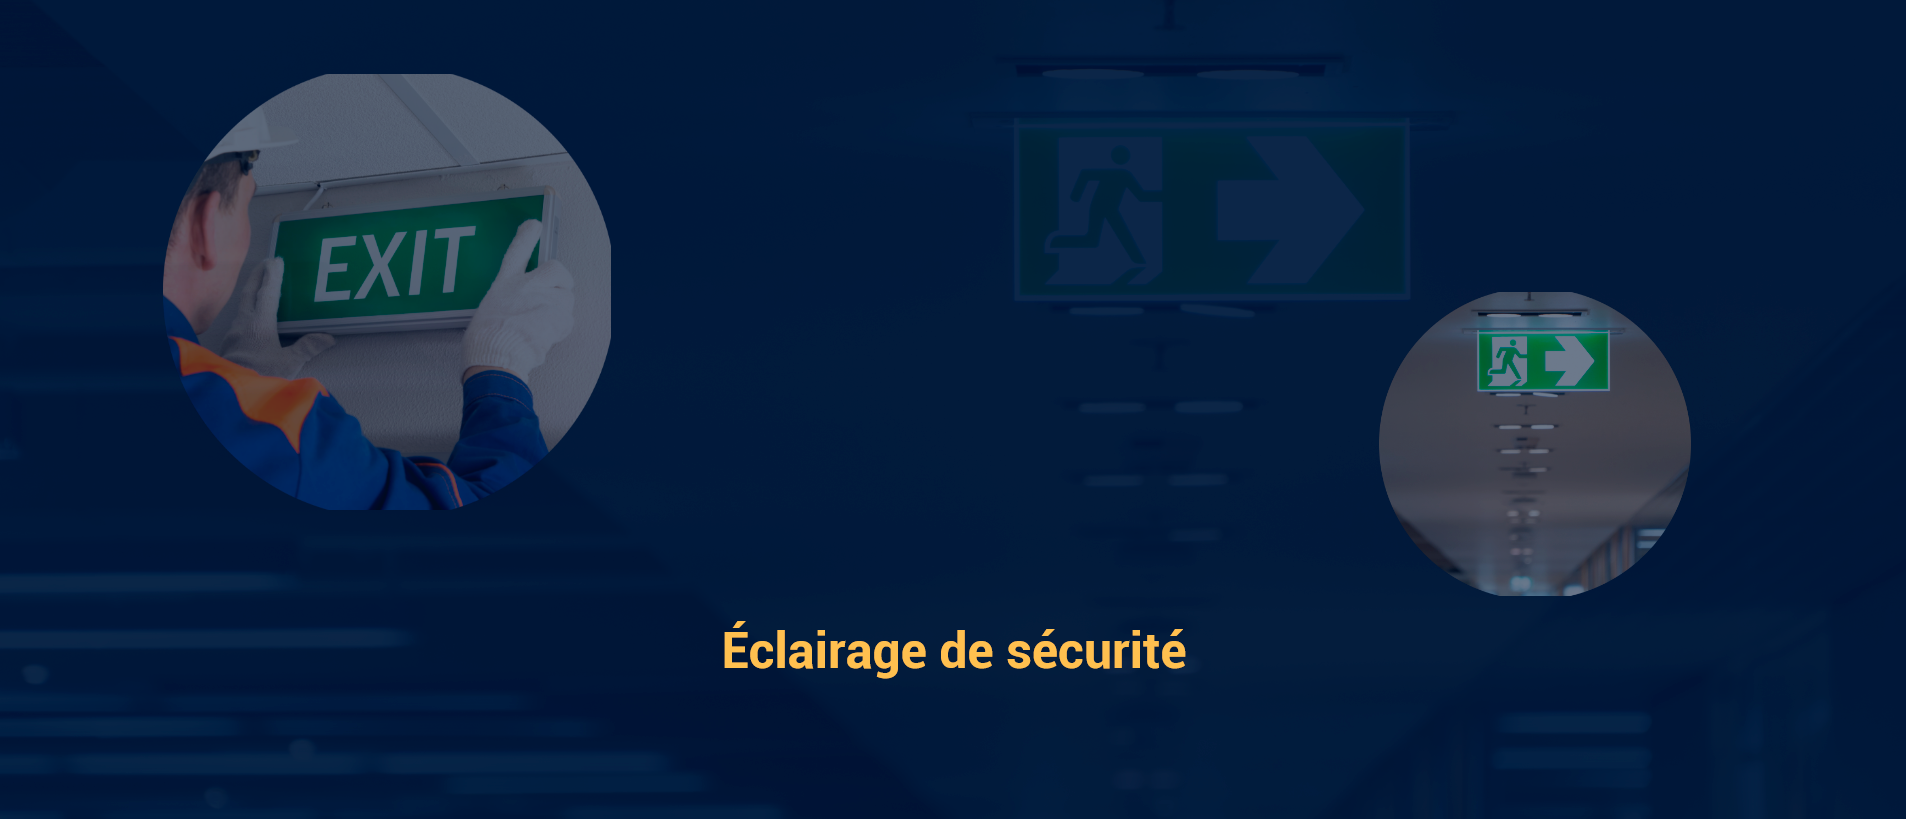 https://www.eris-di.com/wp-content/uploads/2021/07/Eclairage-securite_2.png